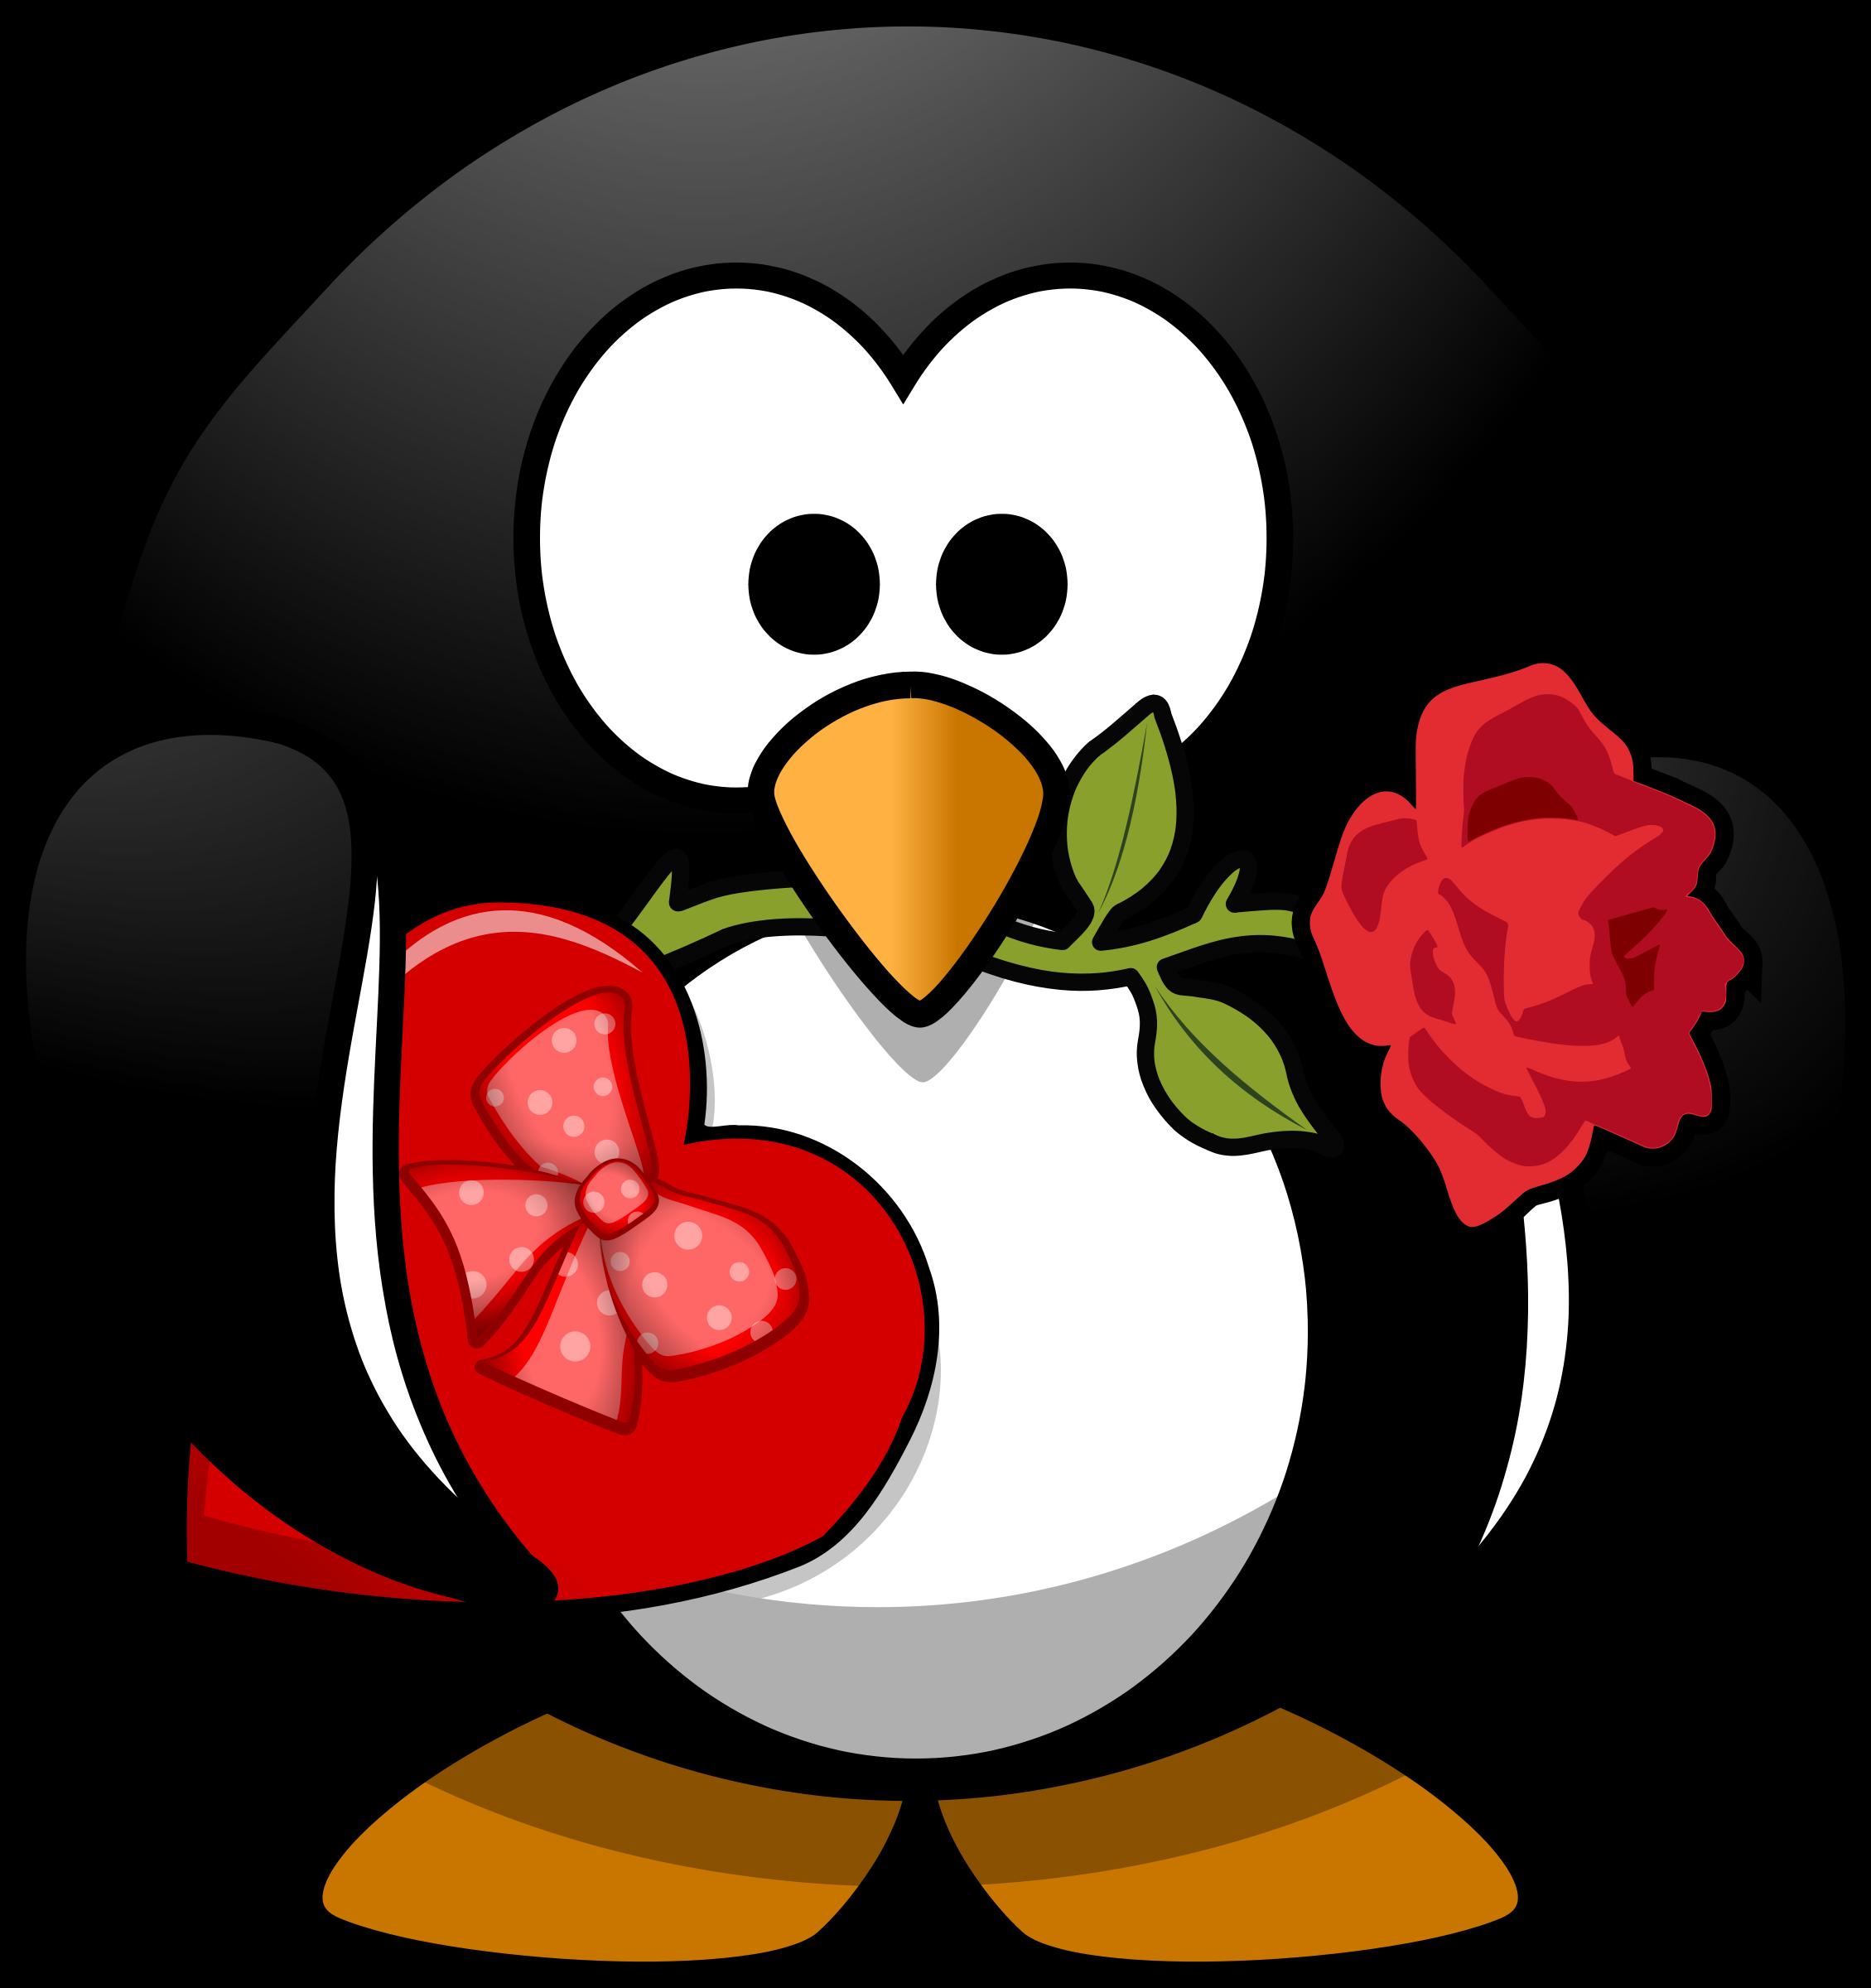 Free valentines clipart banner transparent download My Special Valentine Clipart banner transparent download